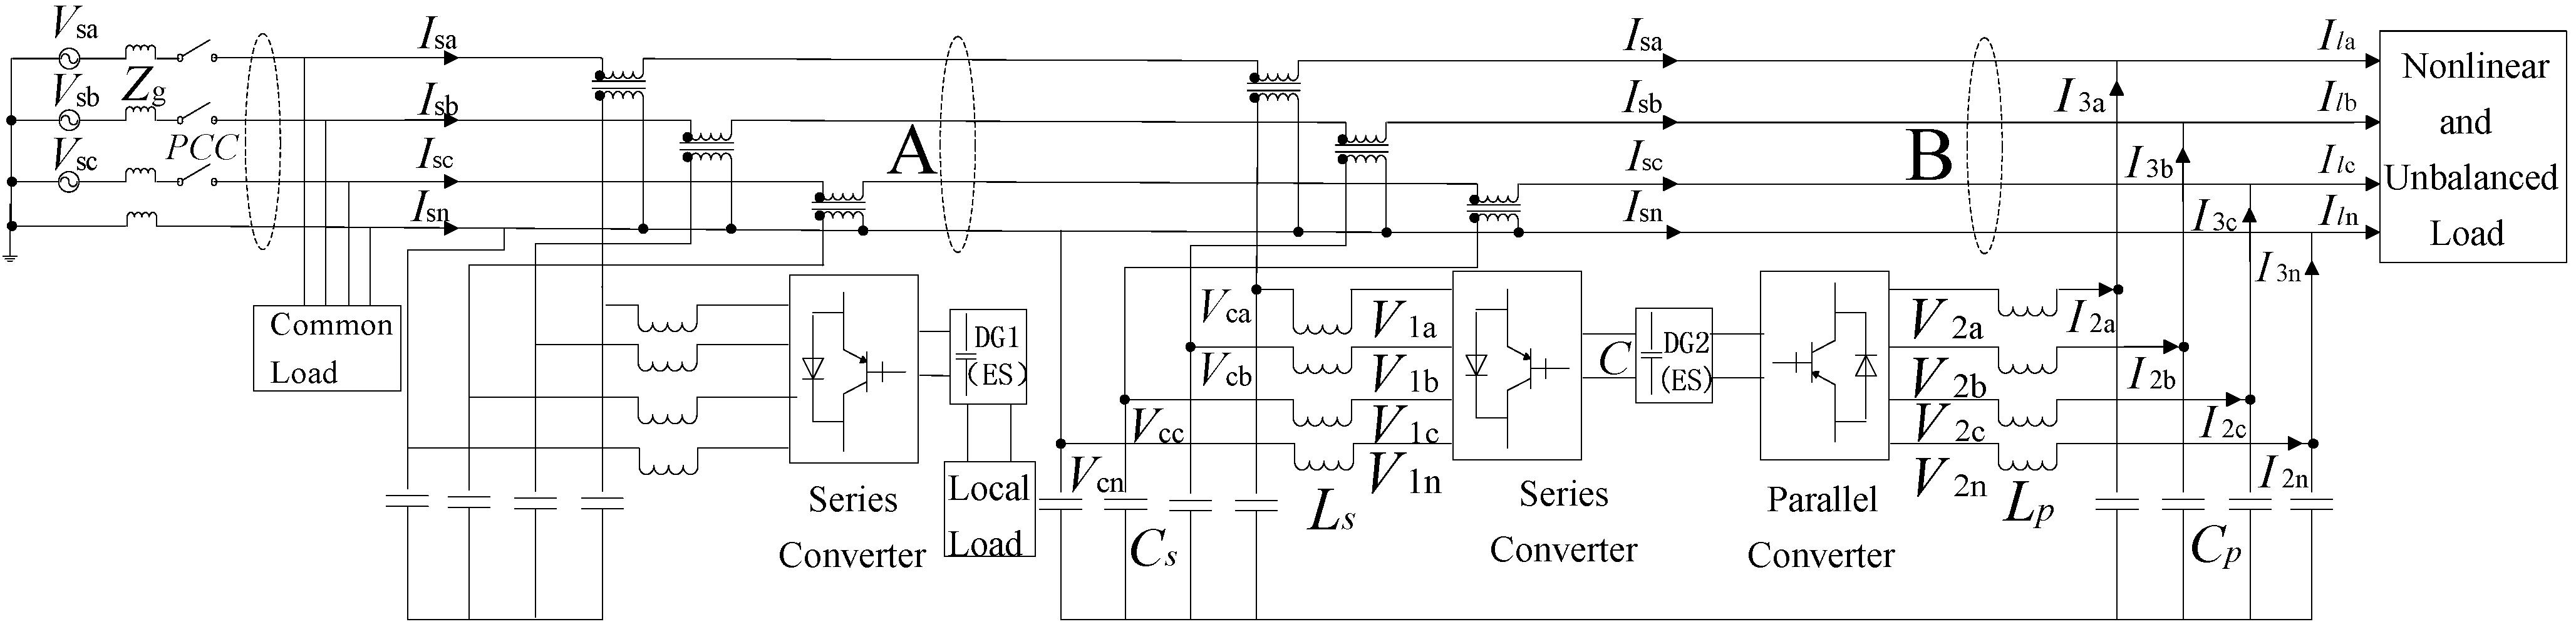 isb 300 pcm wiring diagram